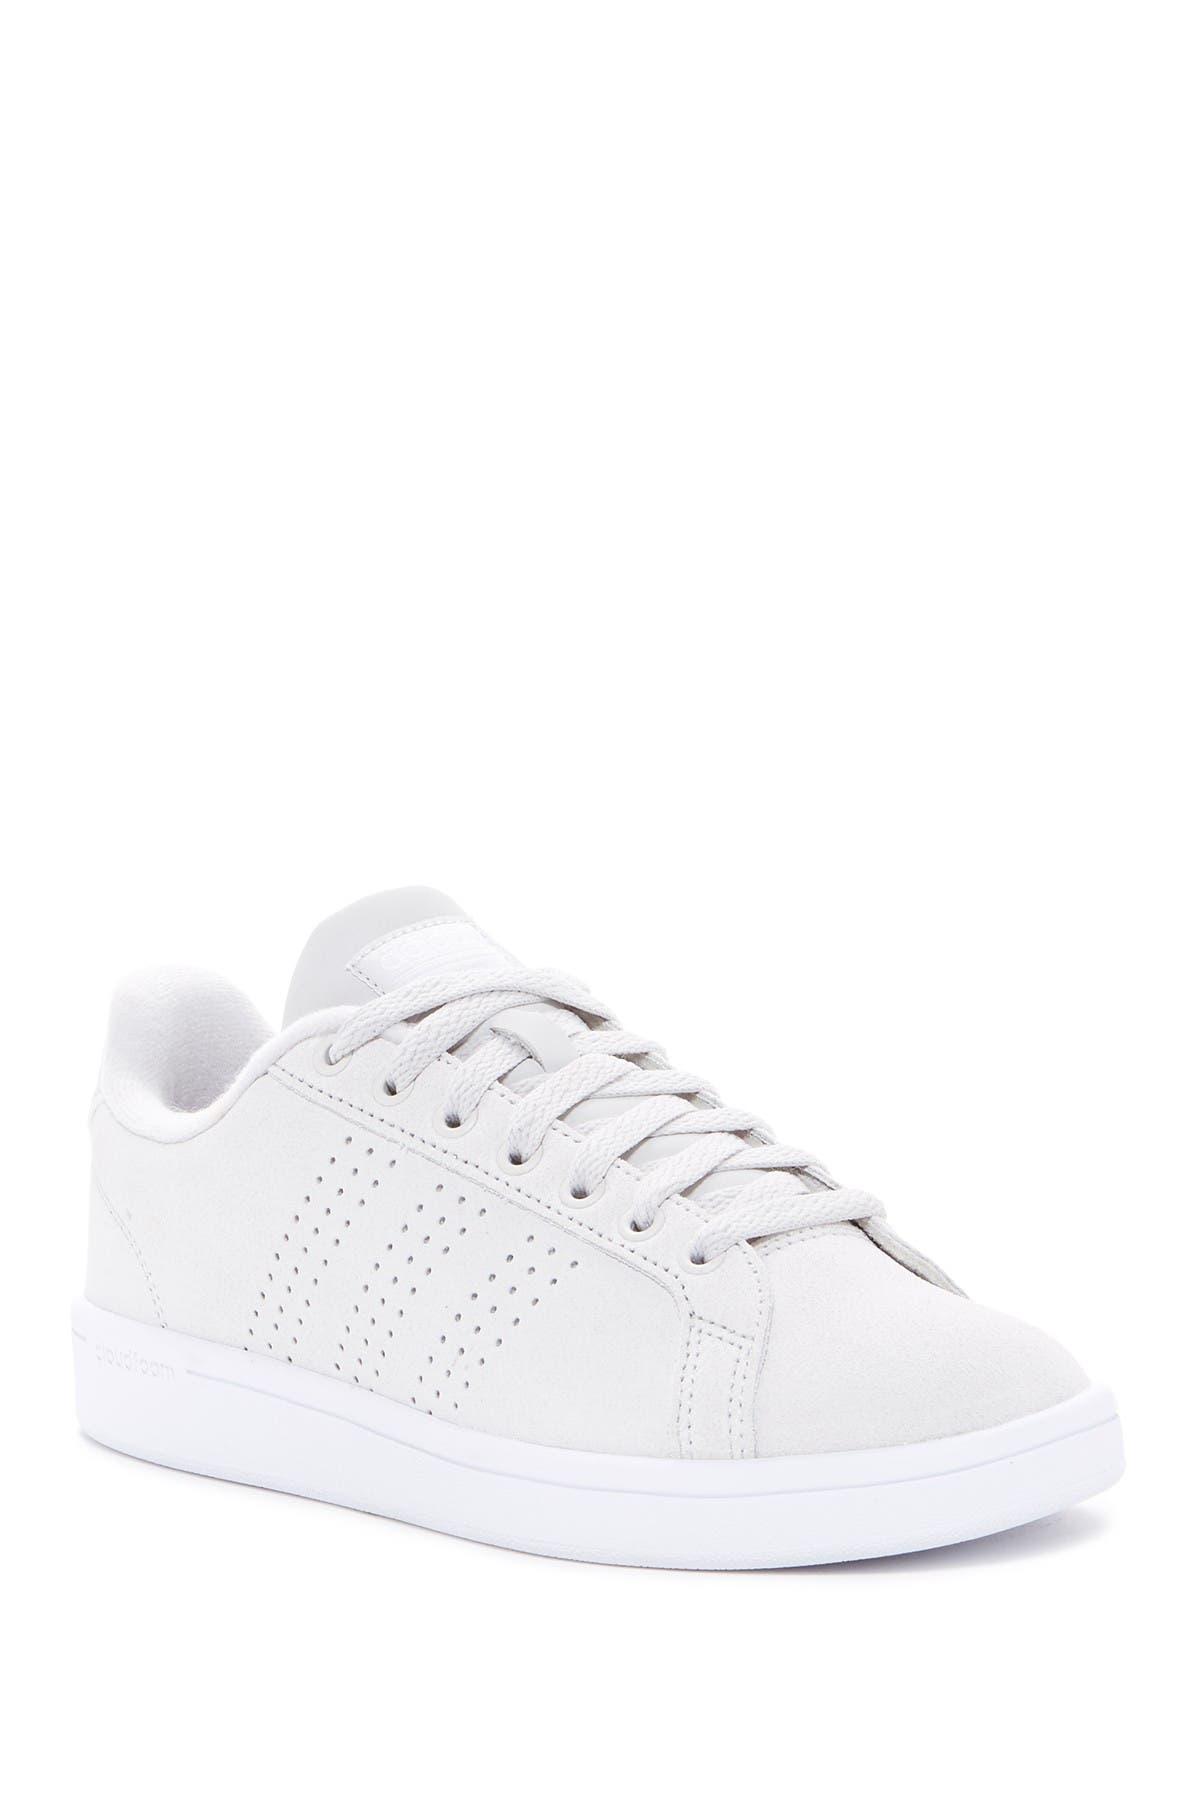 adidas | Cloudfoam Advantage Clean Sneaker | Nordstrom Rack